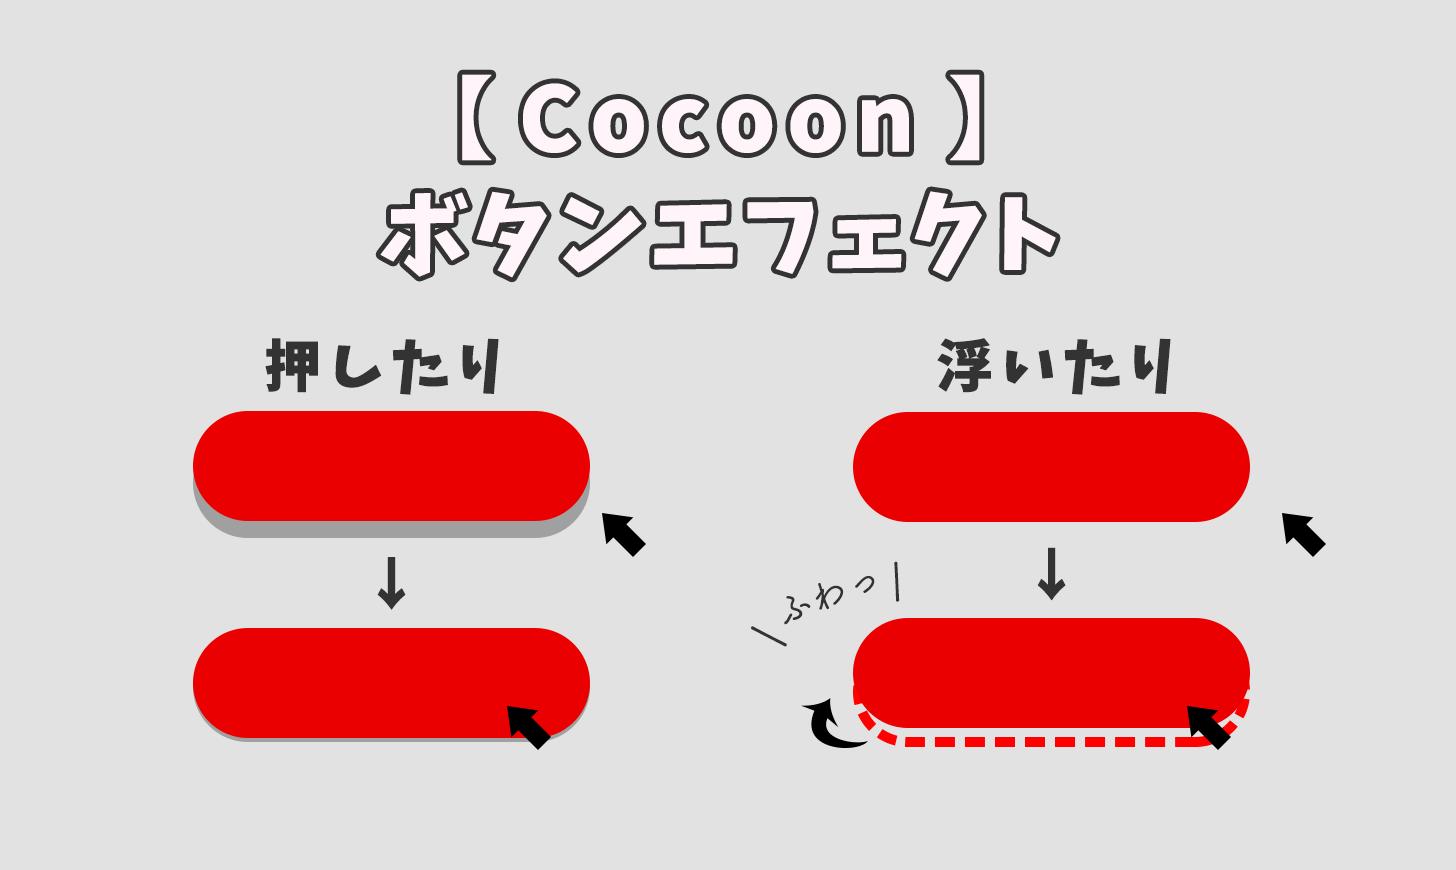 Cocoon ボタン 設定方法